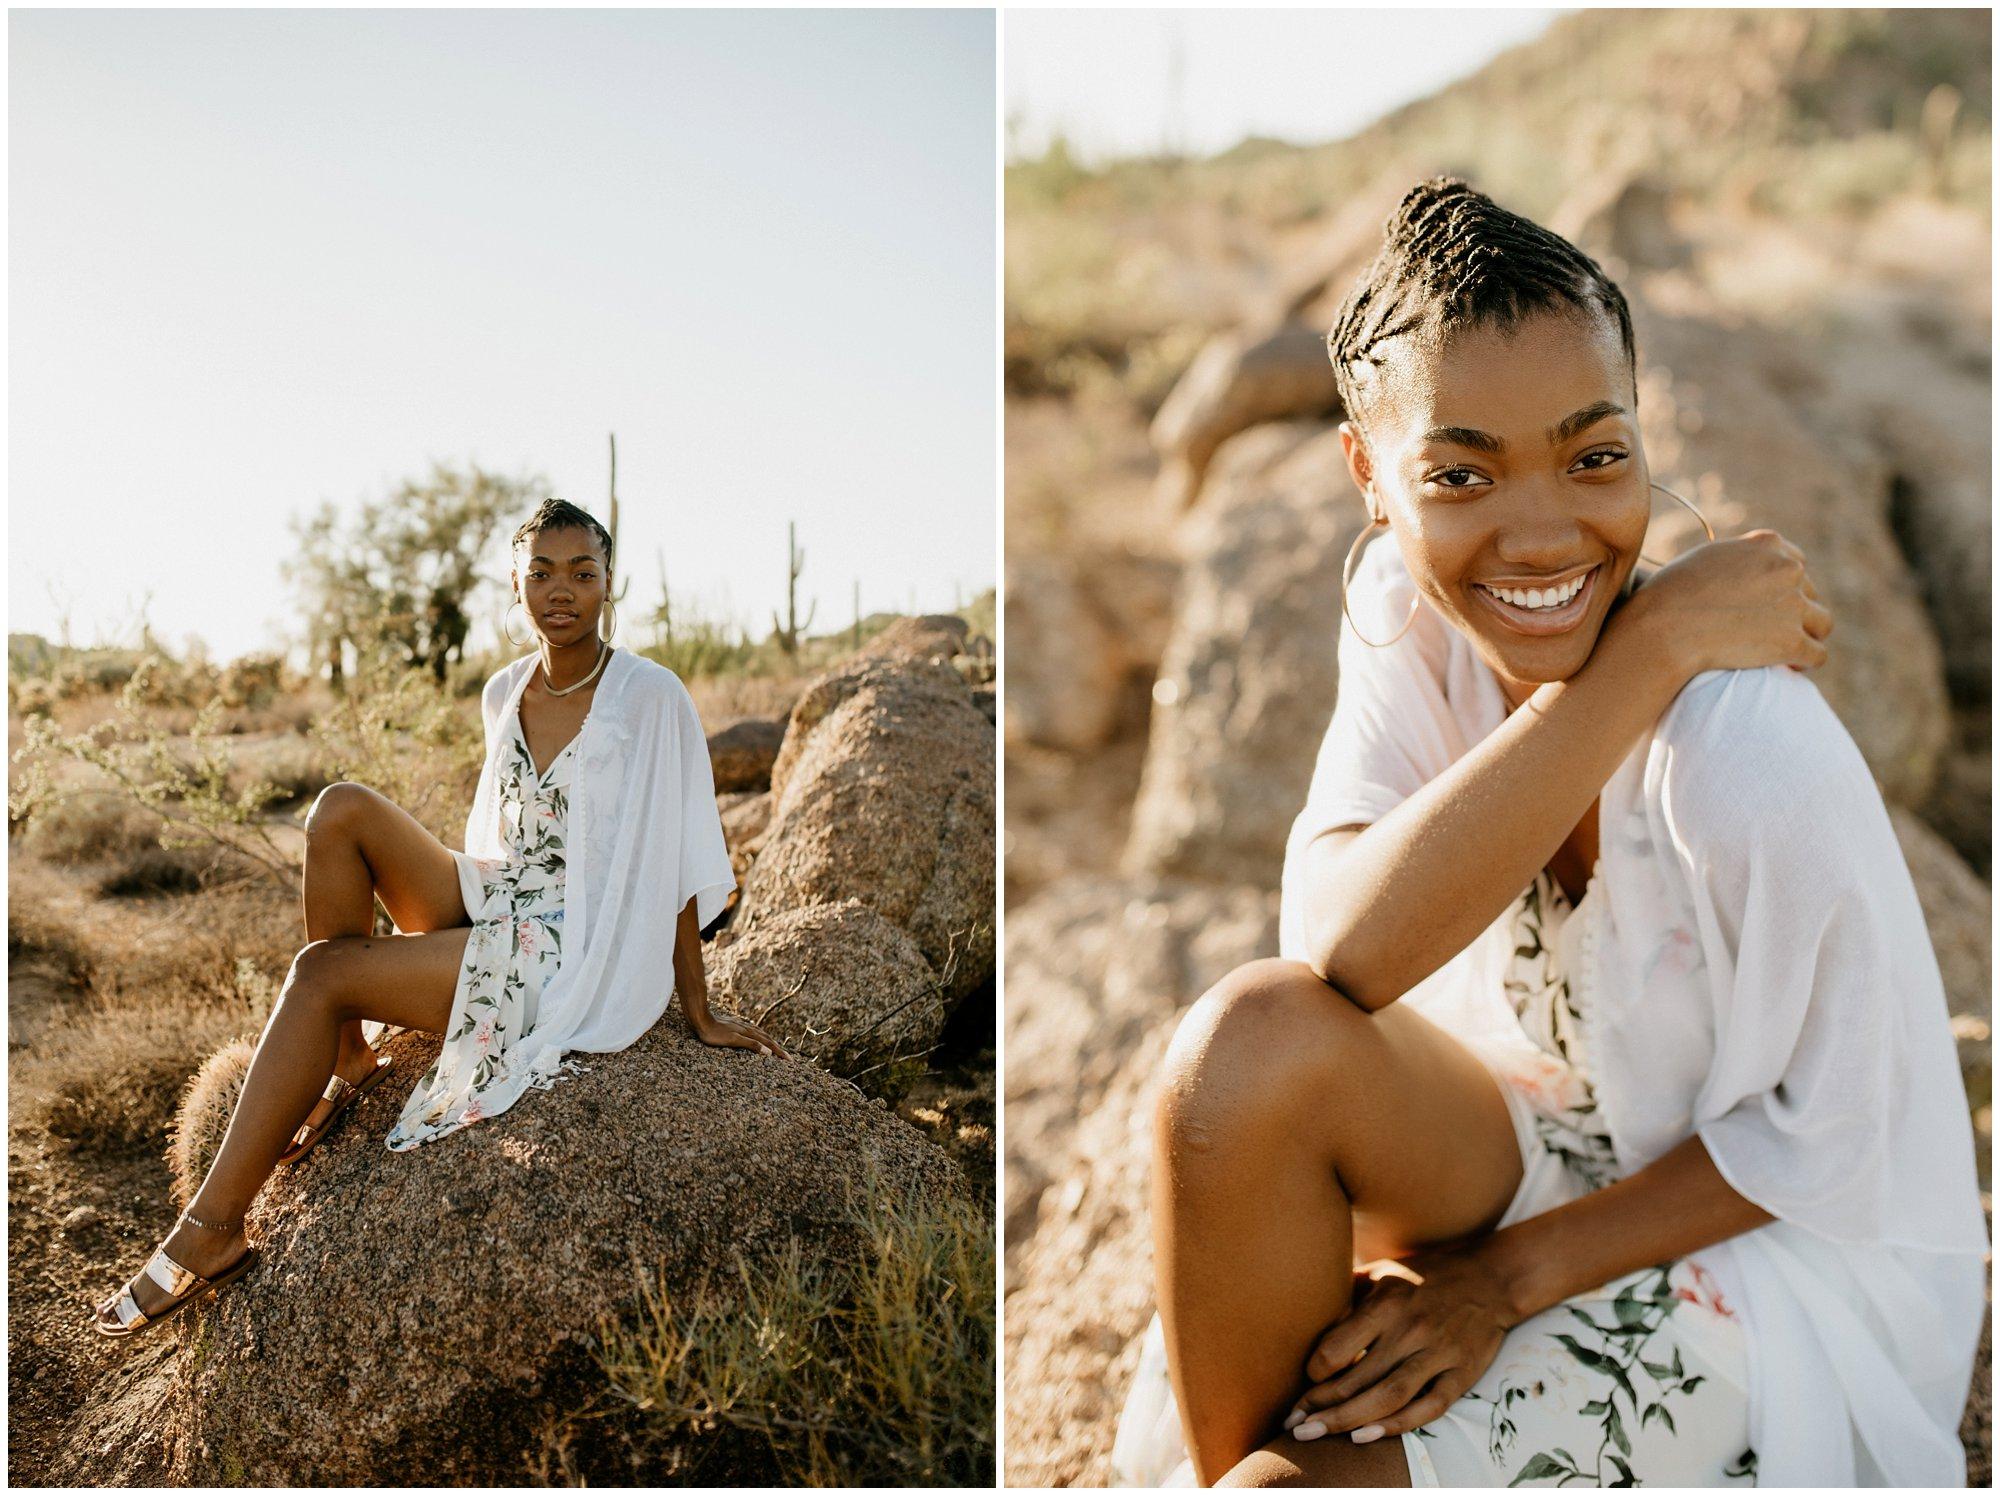 Desert Model Portrait Session - Ashtyn Nicole Photo_0009.jpg